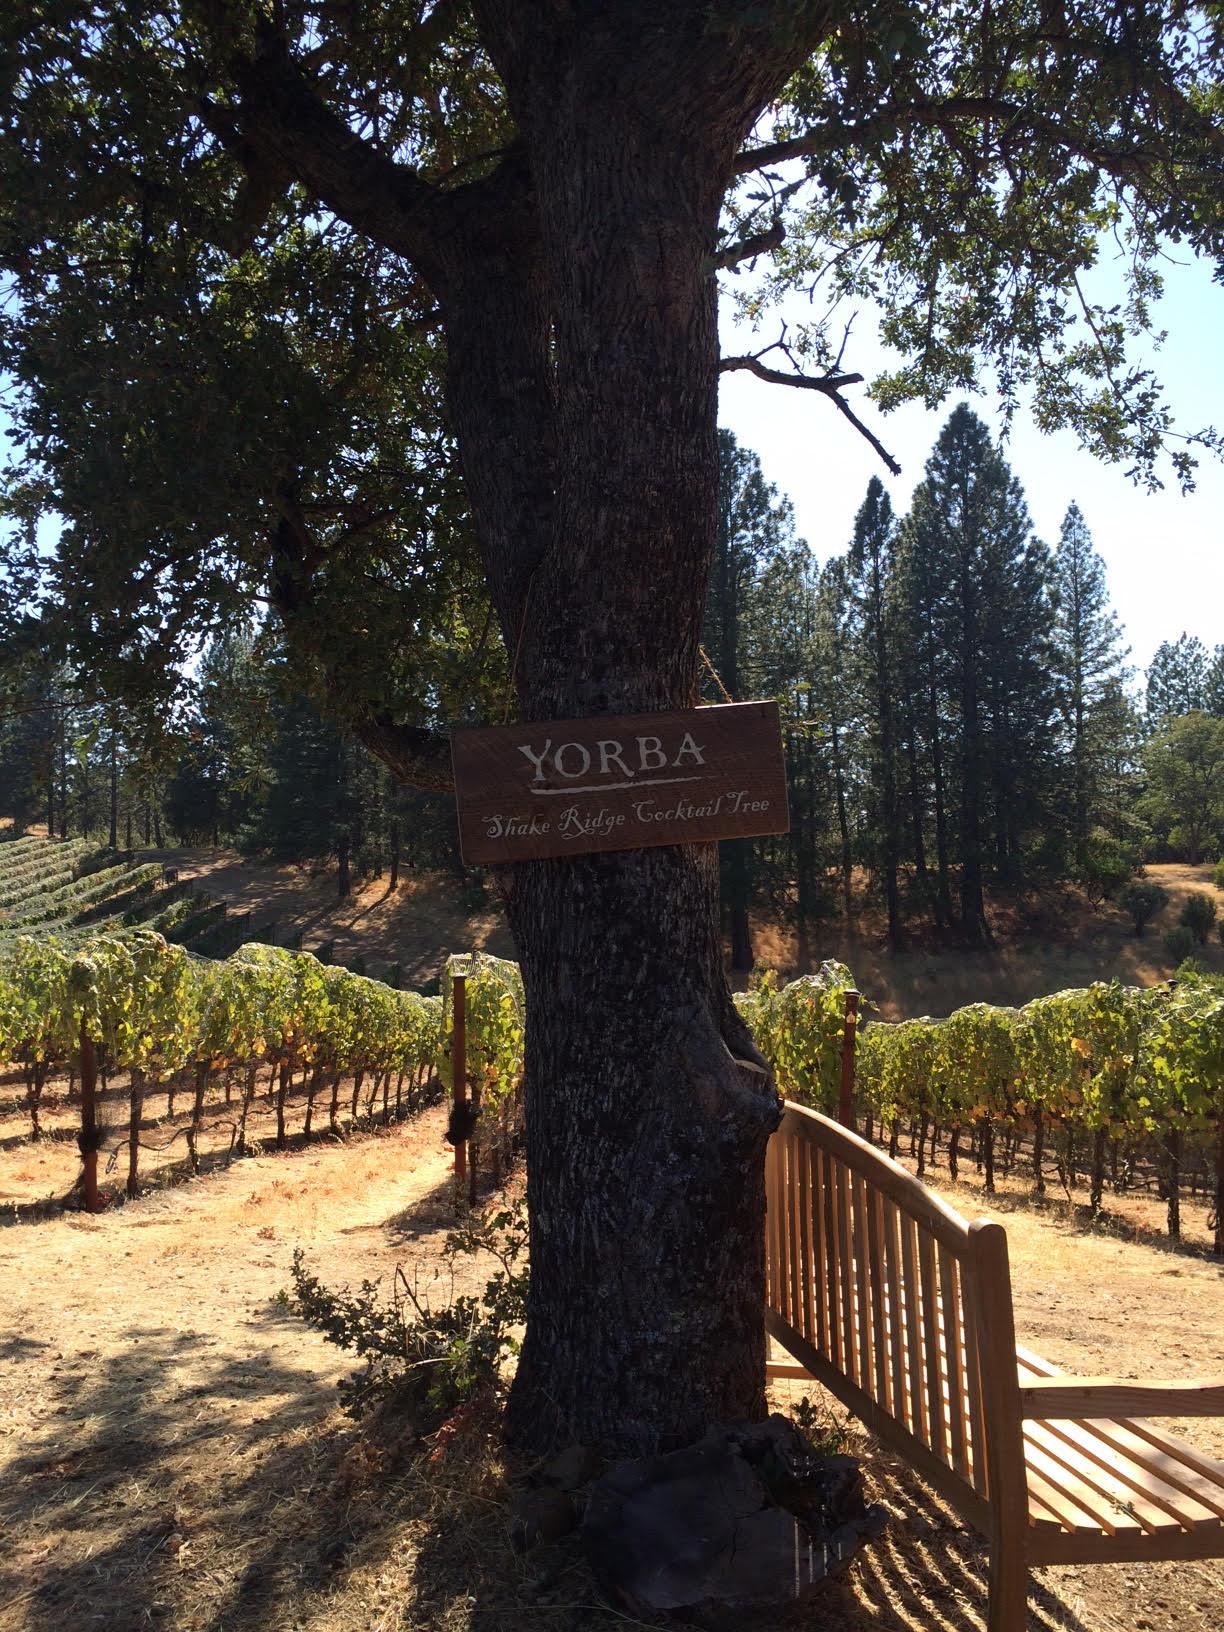 The 'Cocktail Tree' at Shake Ridge vineyard. Photo courtesy of Alex Fondren.